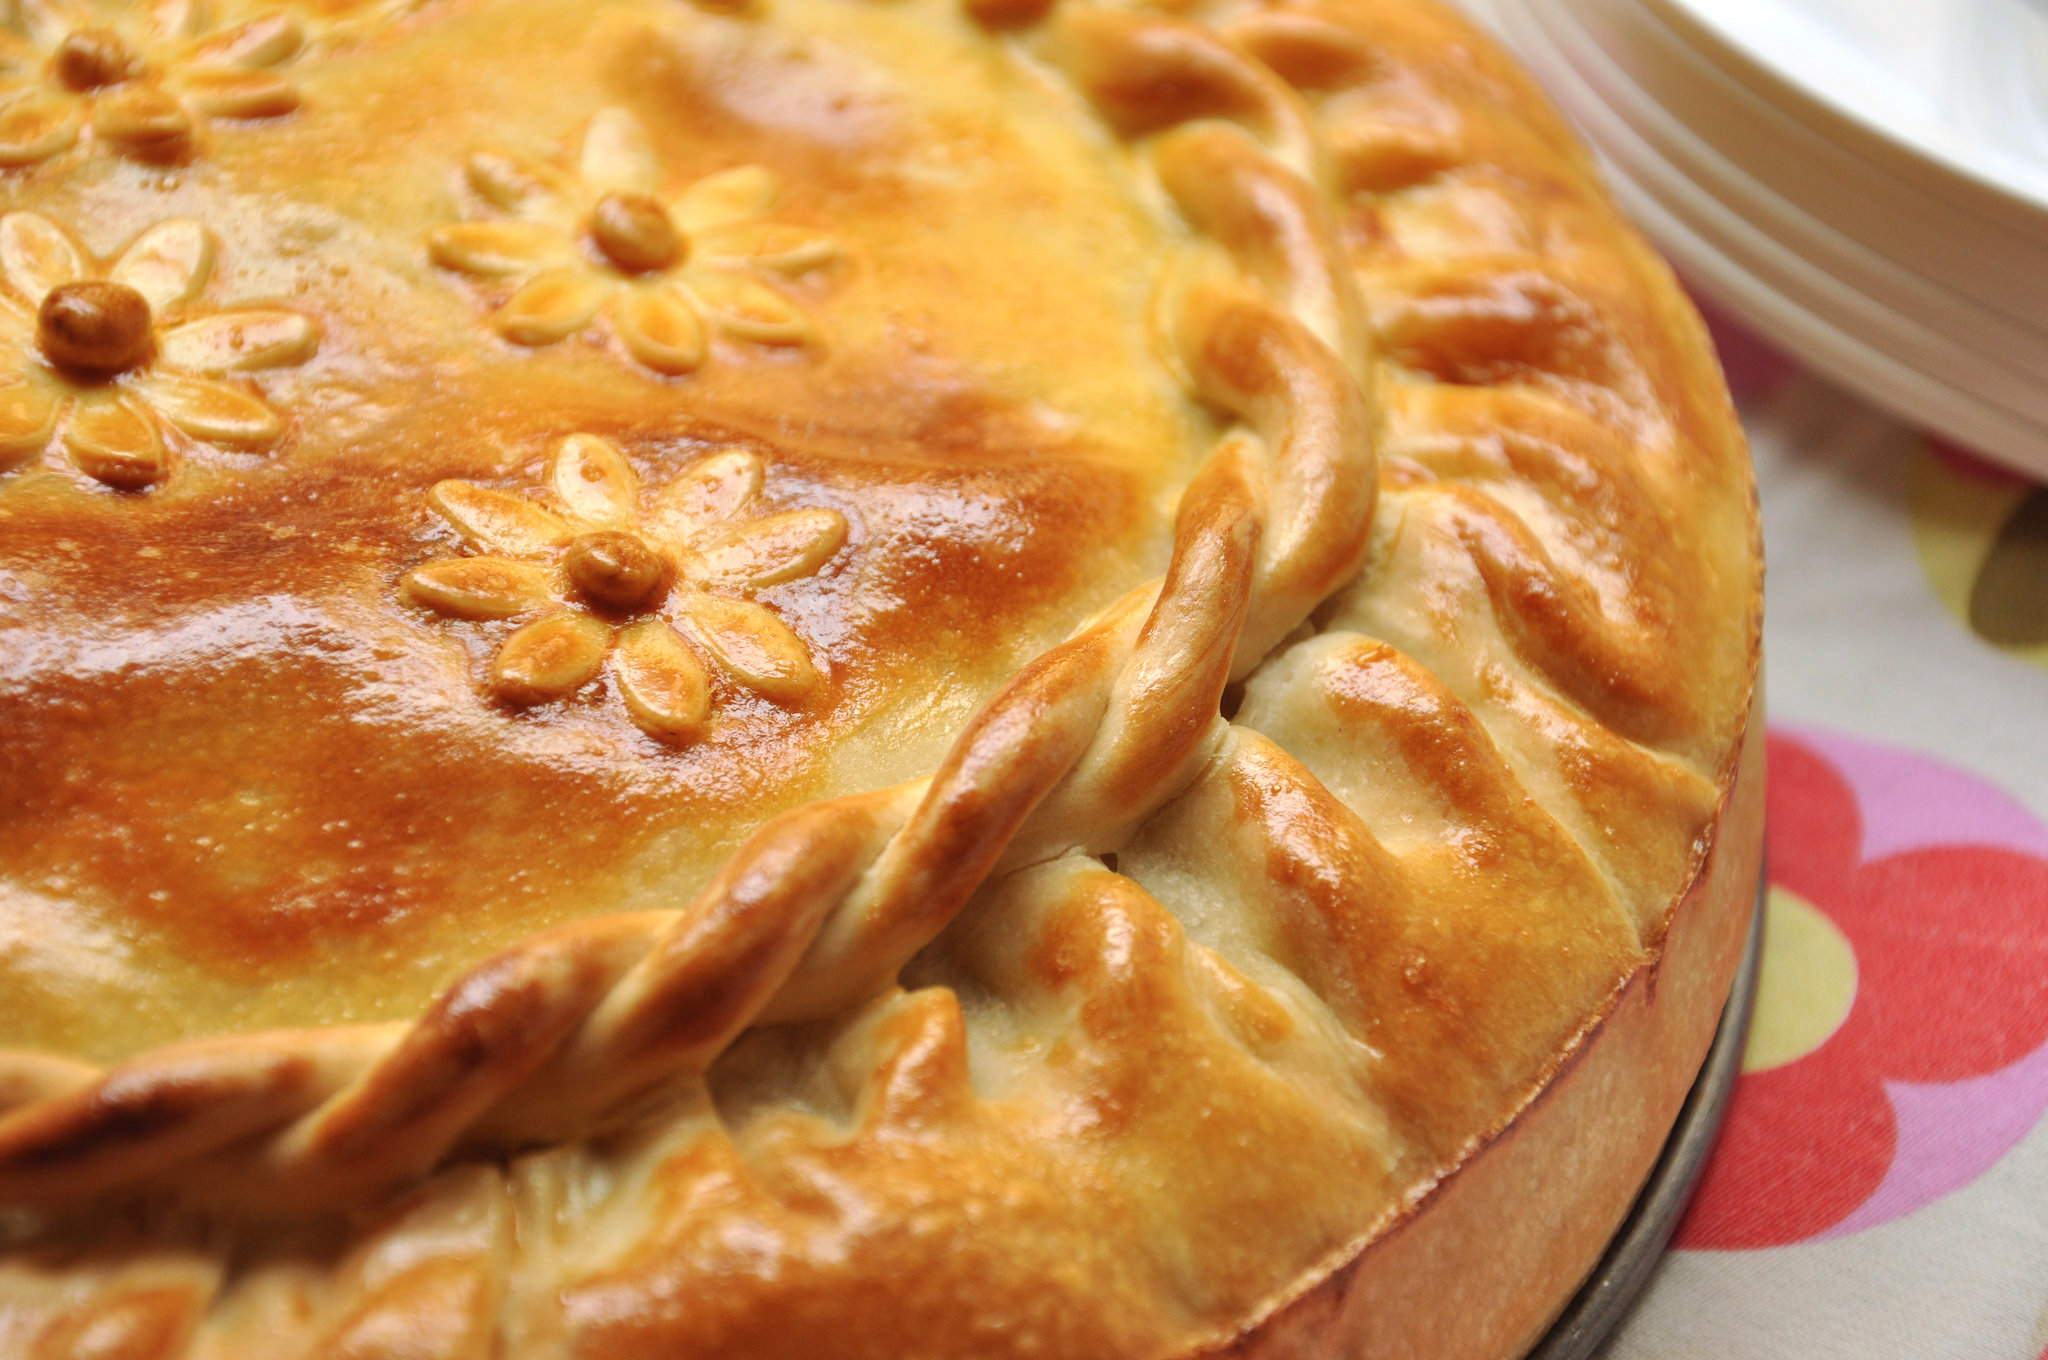 Torta pasqualina ai carciofi bimby tm31 tm5 for Ricette bimby torte